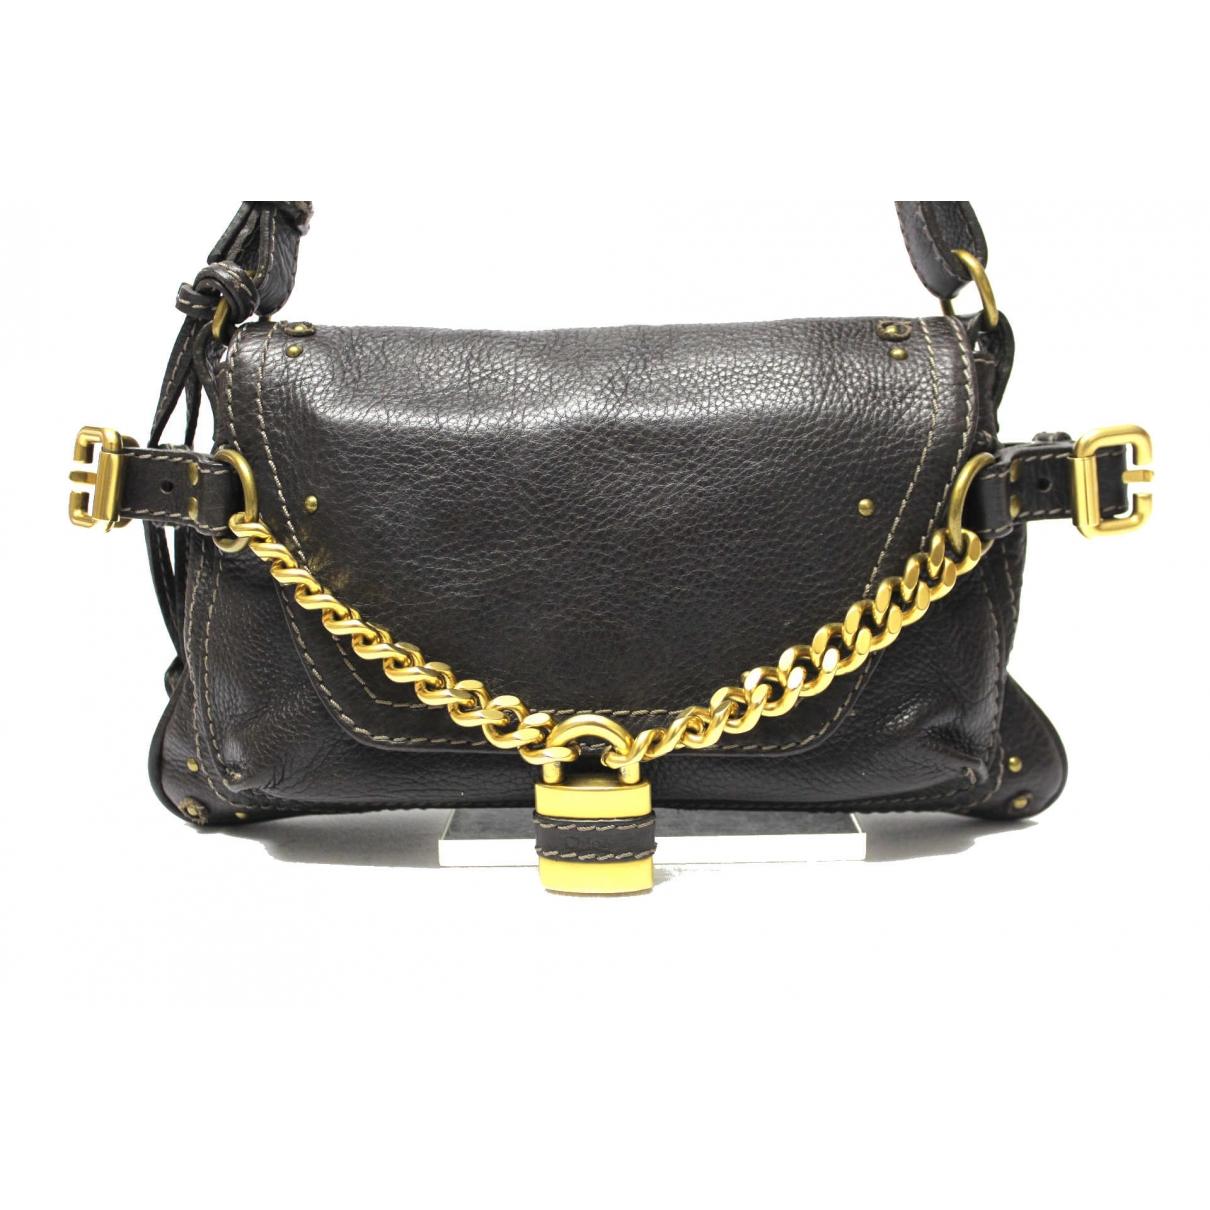 Chloe Paddington Handtasche in  Schwarz Leder